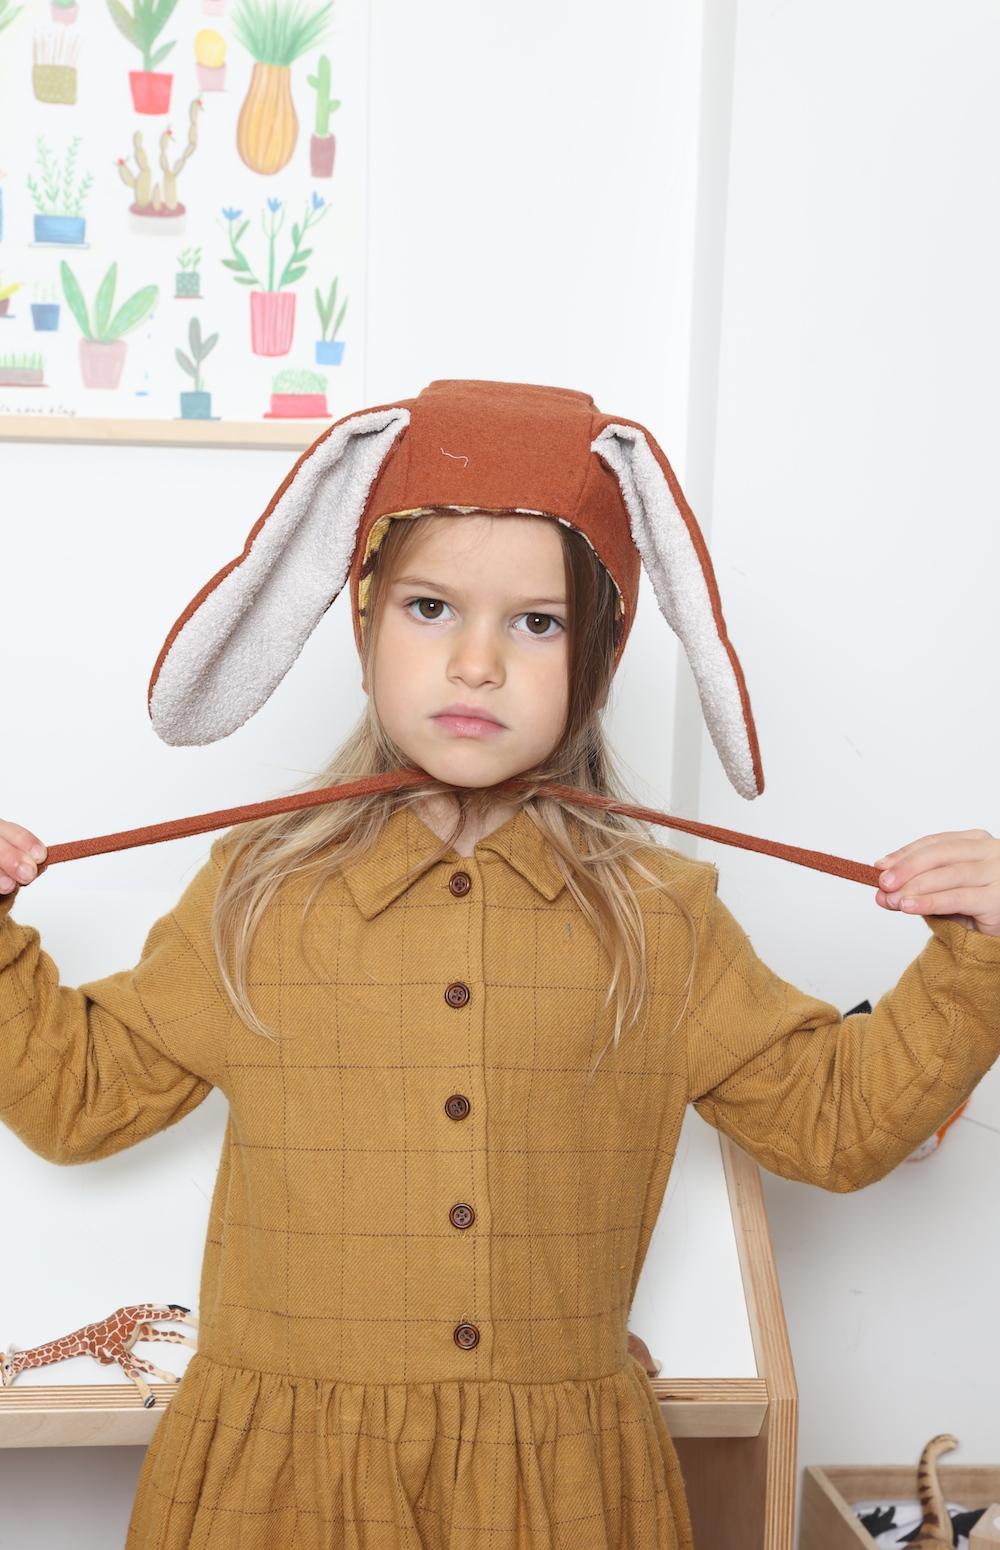 kia_ora_kit_childrens_bunny-rabbit_hat_bonnet_ginger